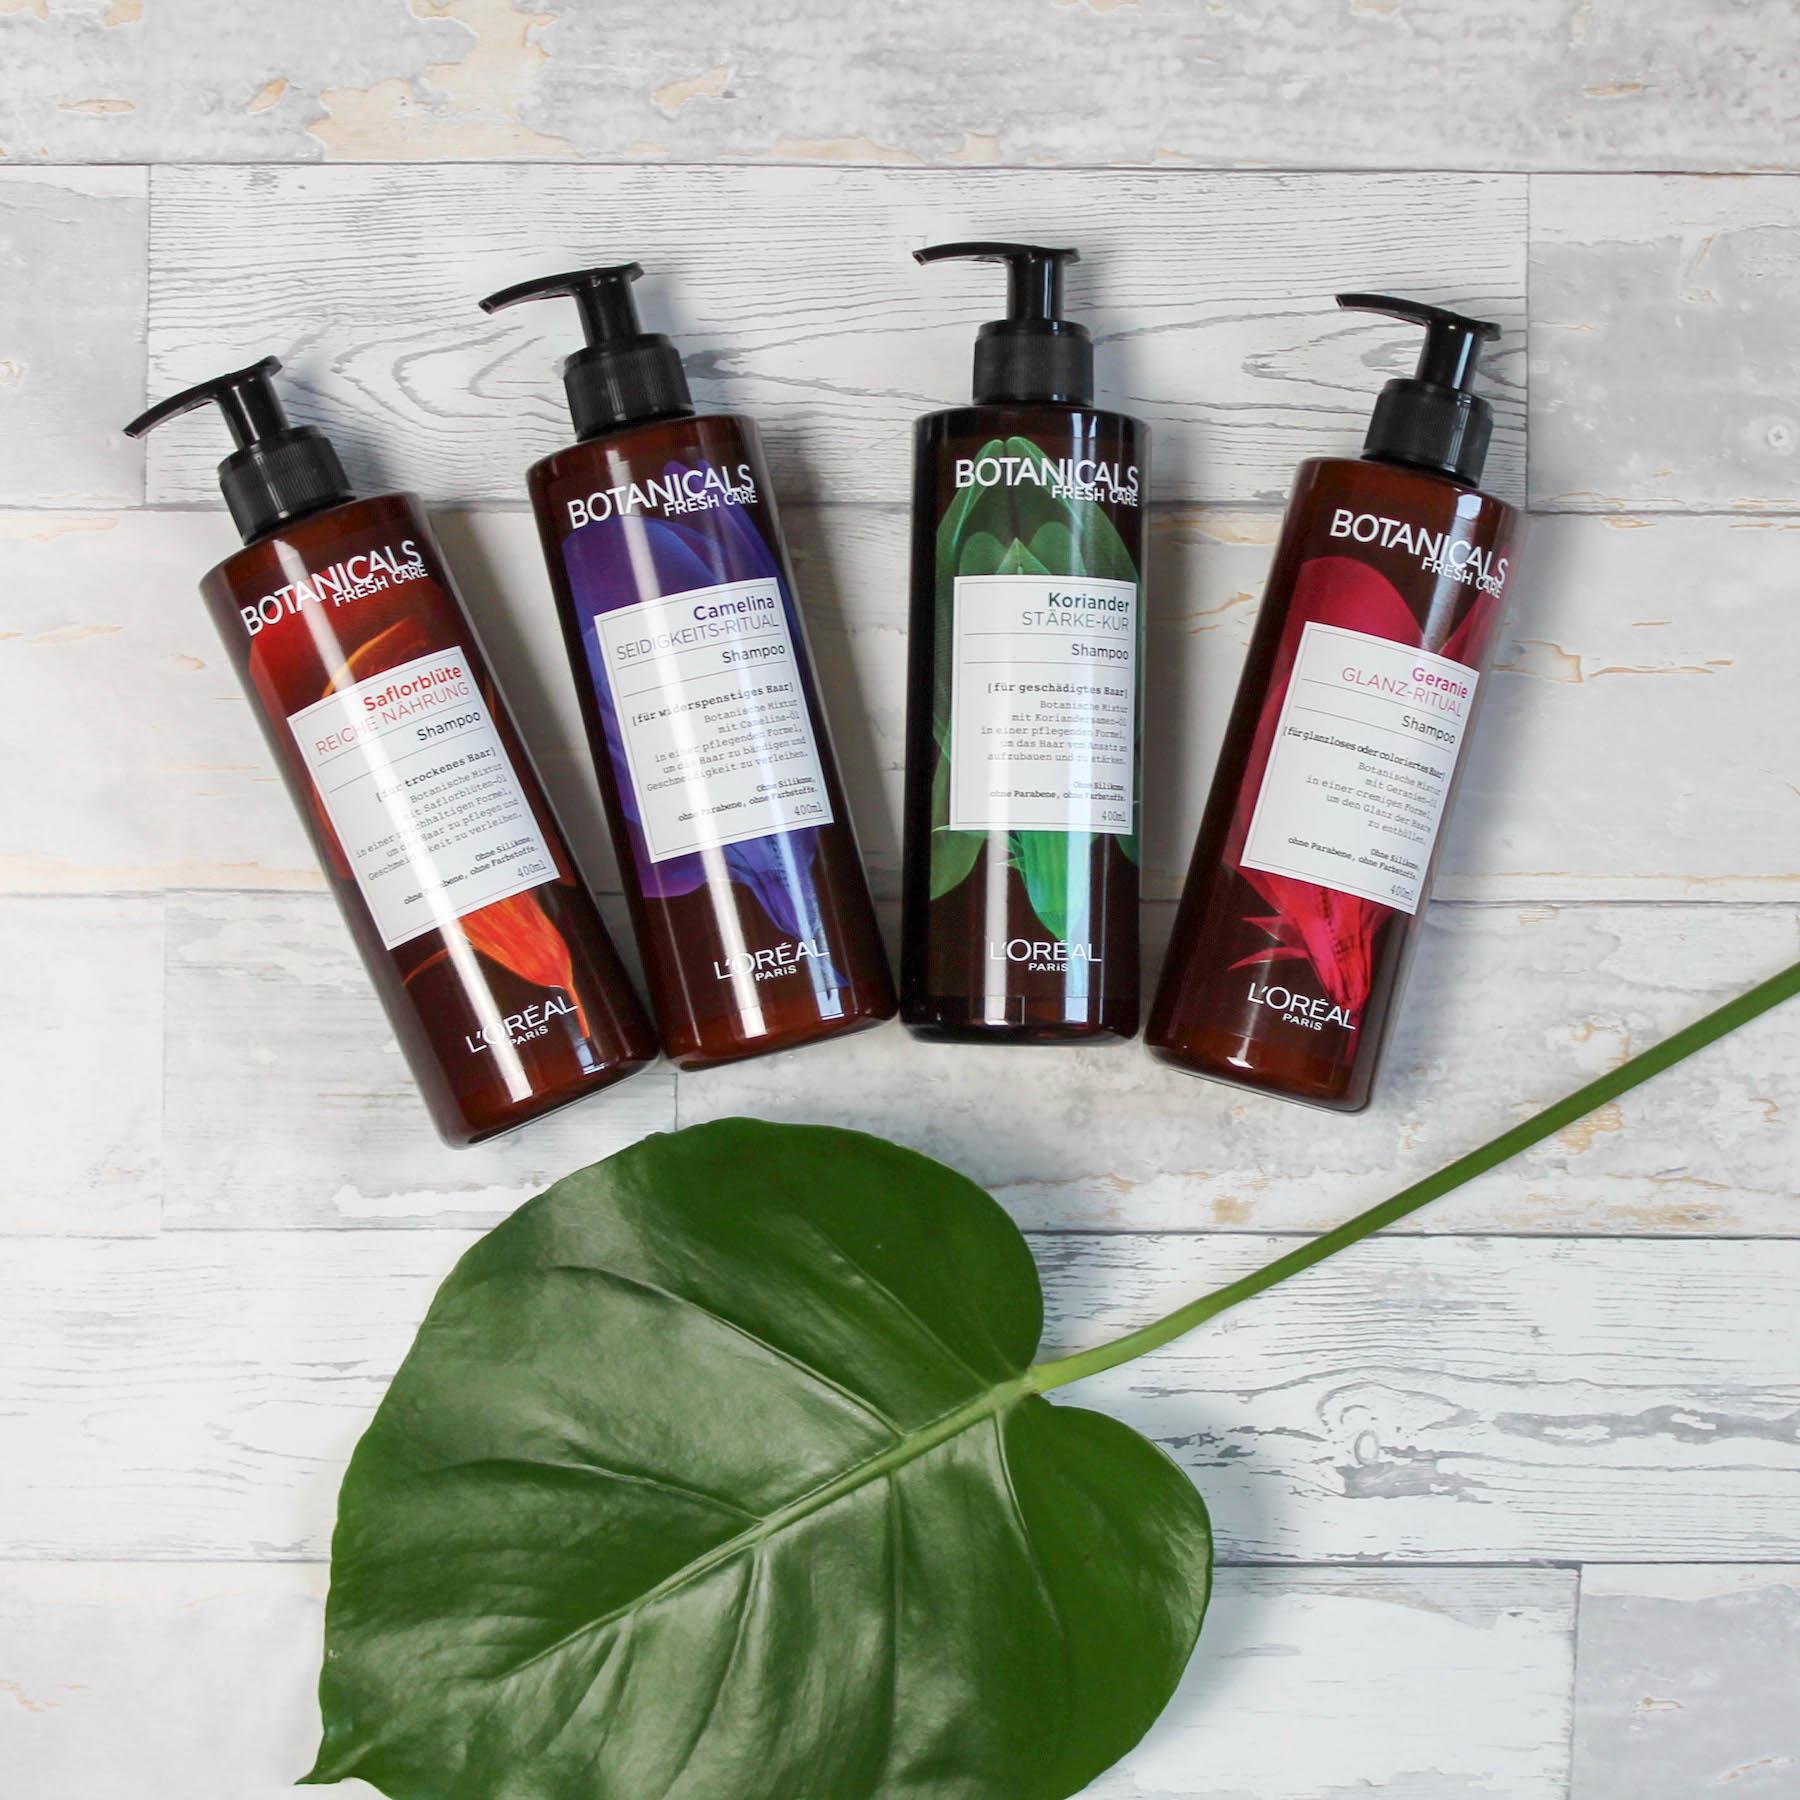 suelovesnyc_susan_fengler_blog_hamburg_botanicals_shampoo_serie